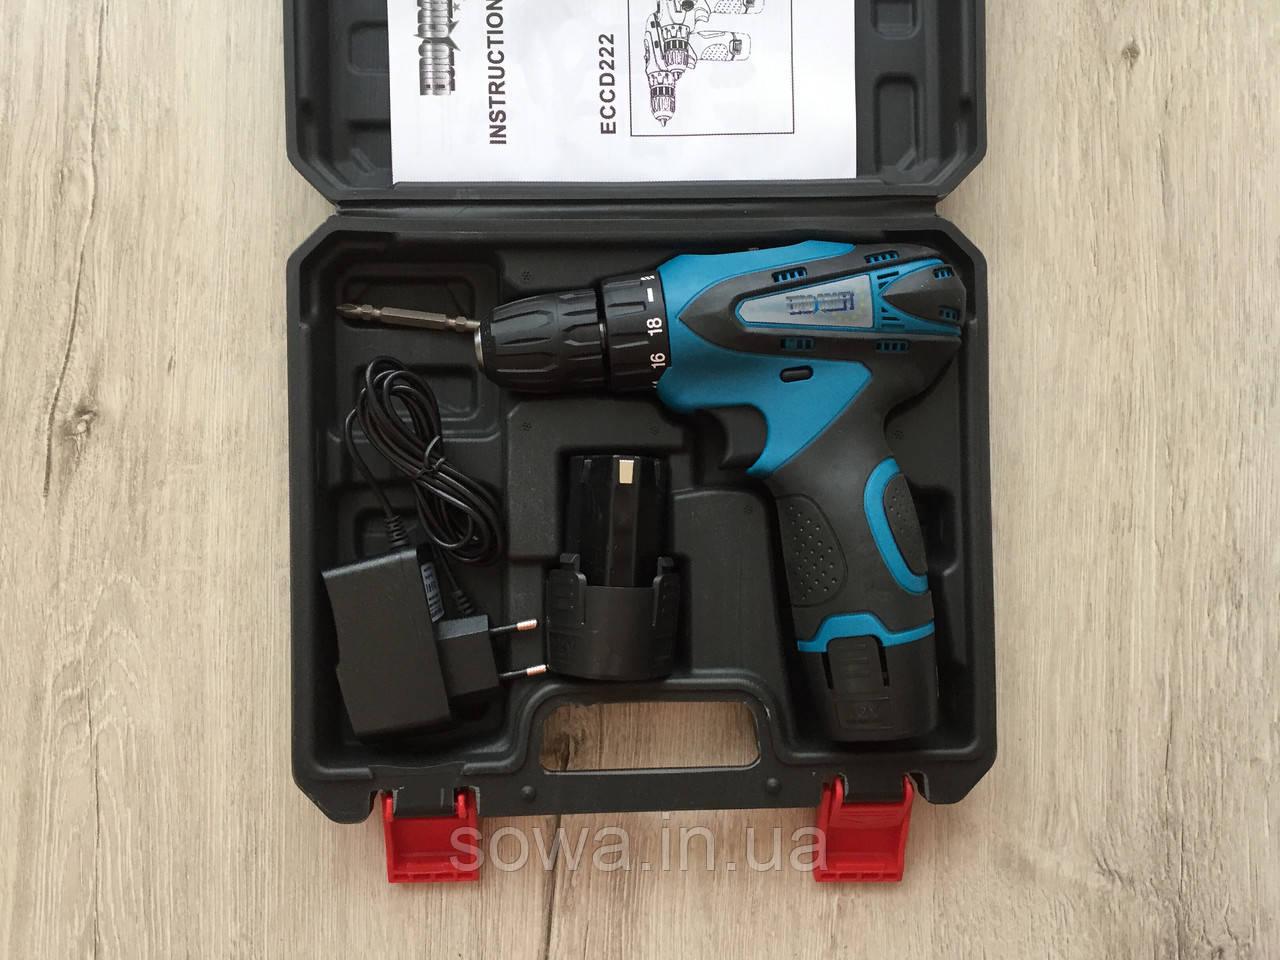 ✔️ Шуруповерт акумуляторний Euro Craft ECCD222 ( 12 Вт , Li-Ion , 1.5 А/ч )